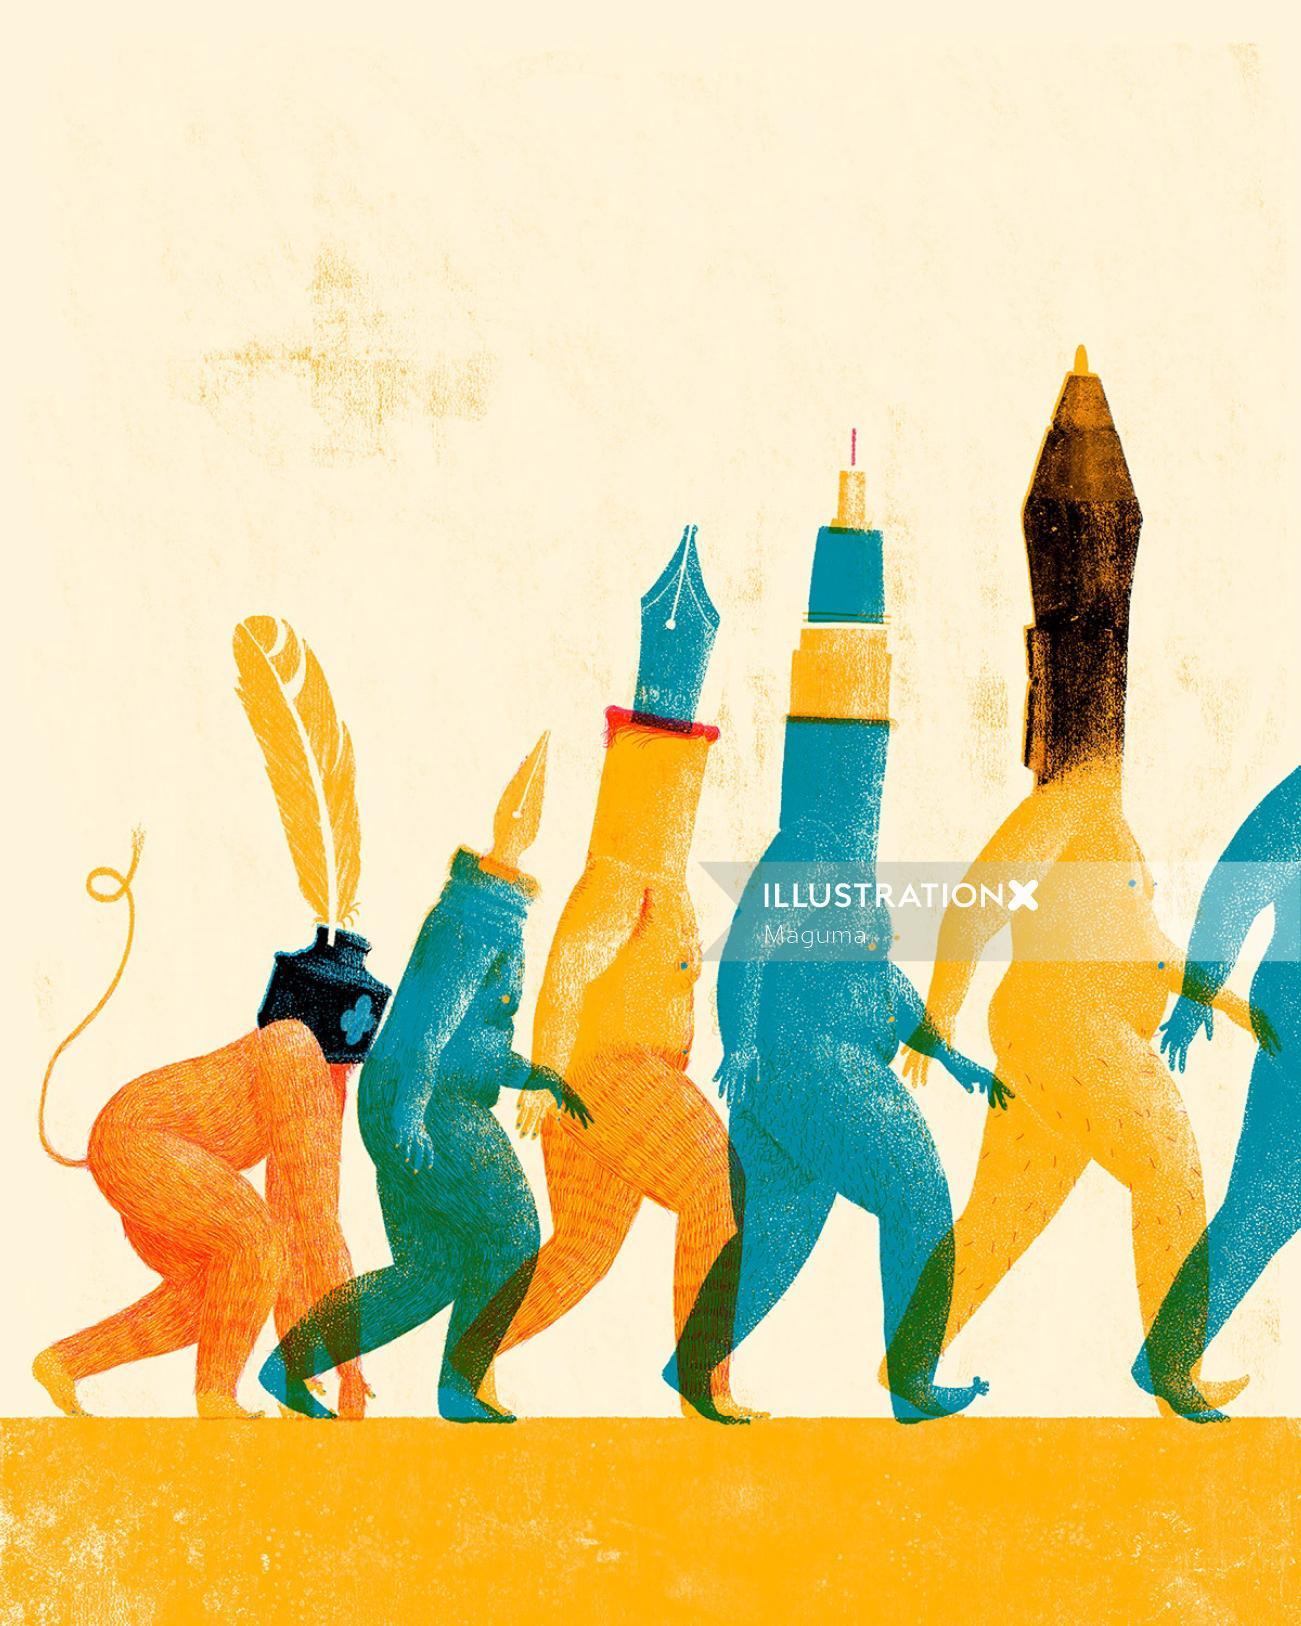 evolution of pens over time